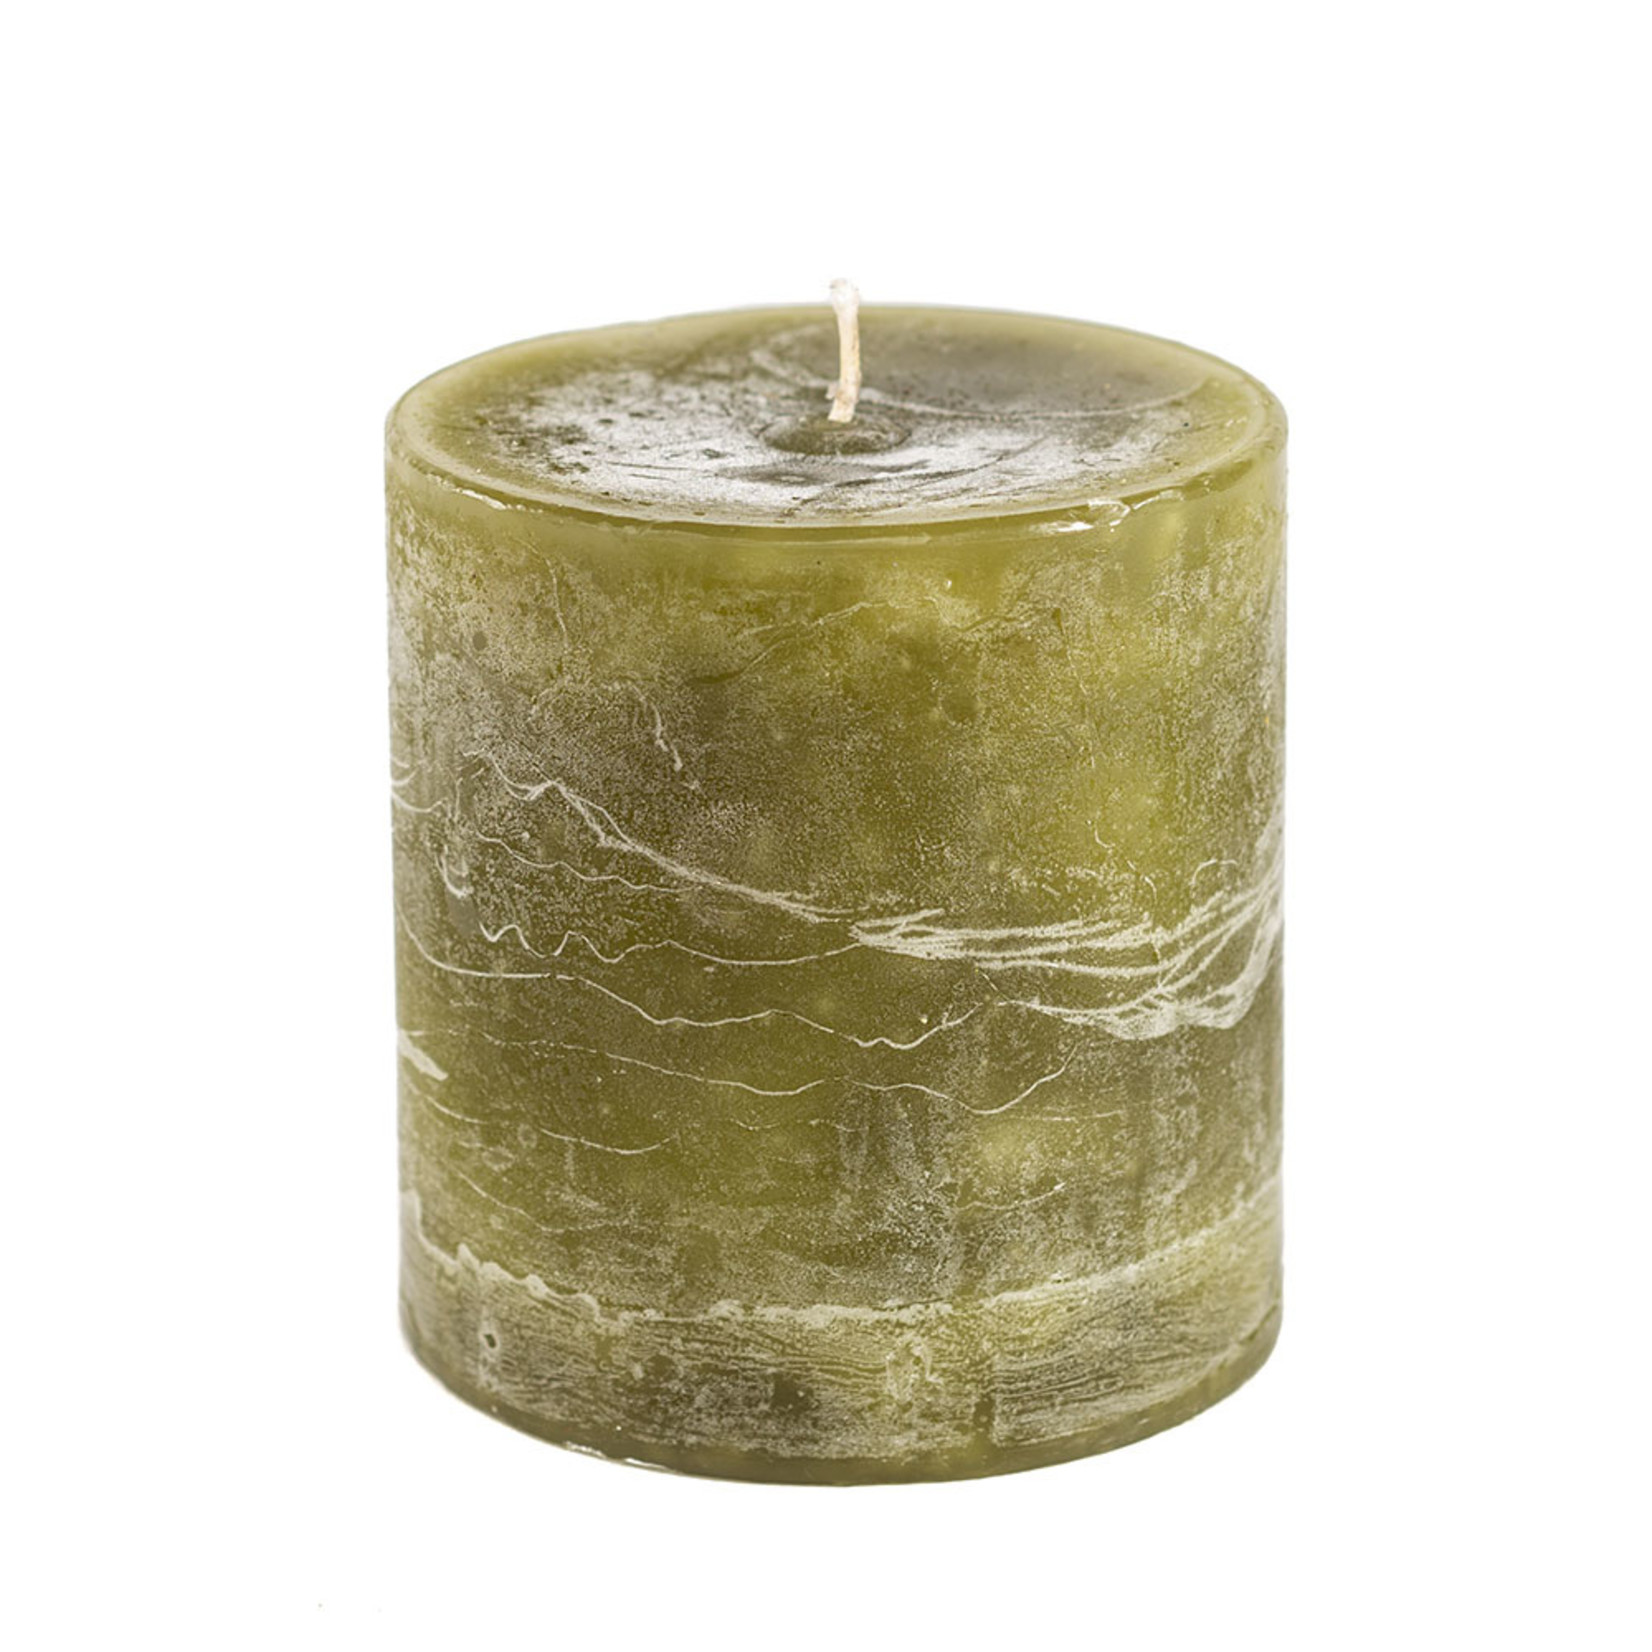 Home Society Pillar Candle 9x10cm Green